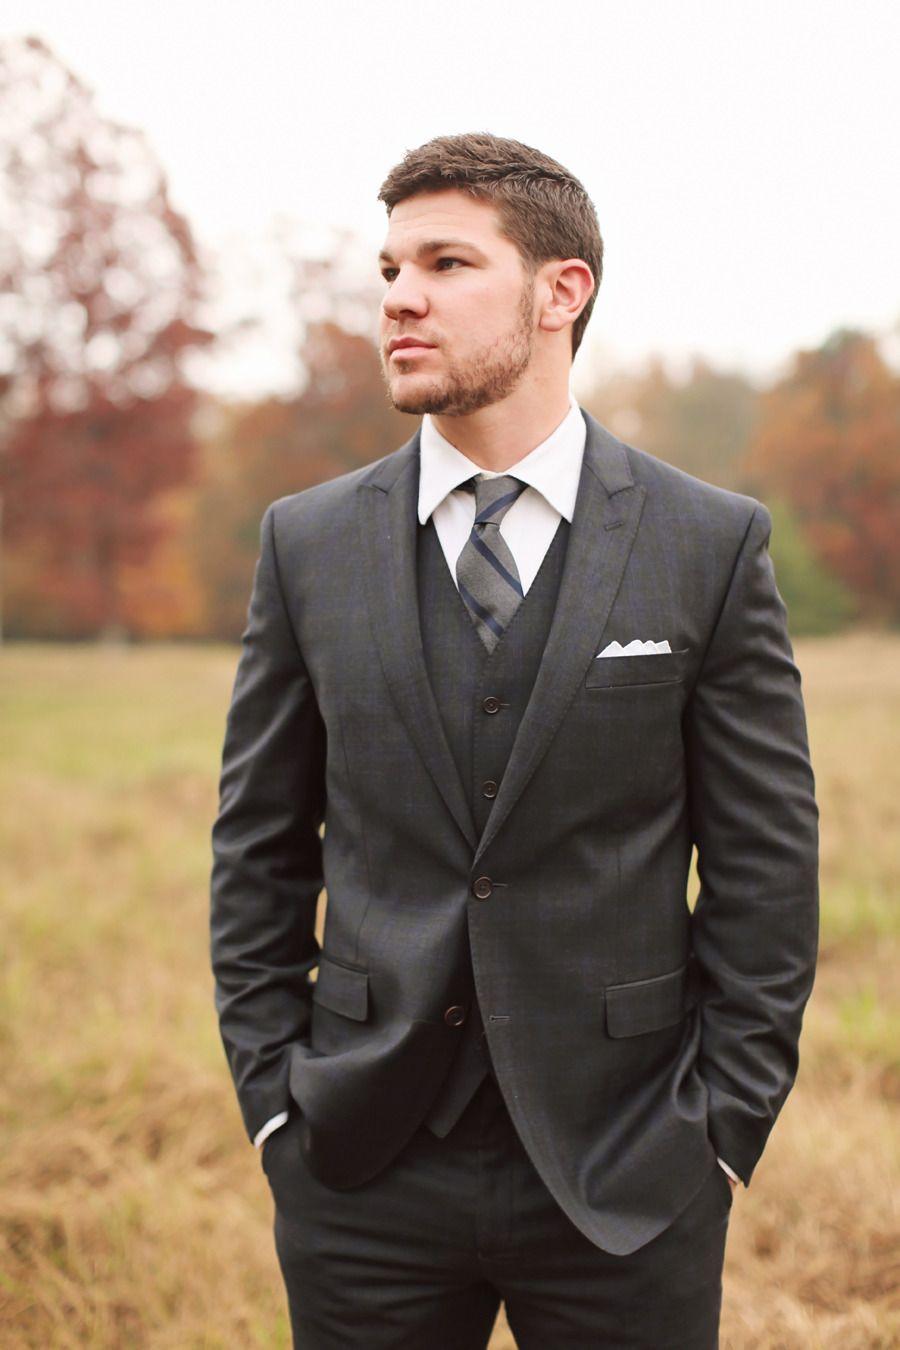 Louisiana Rustic Chic Wedding Inspiration | Dark grey suits ...